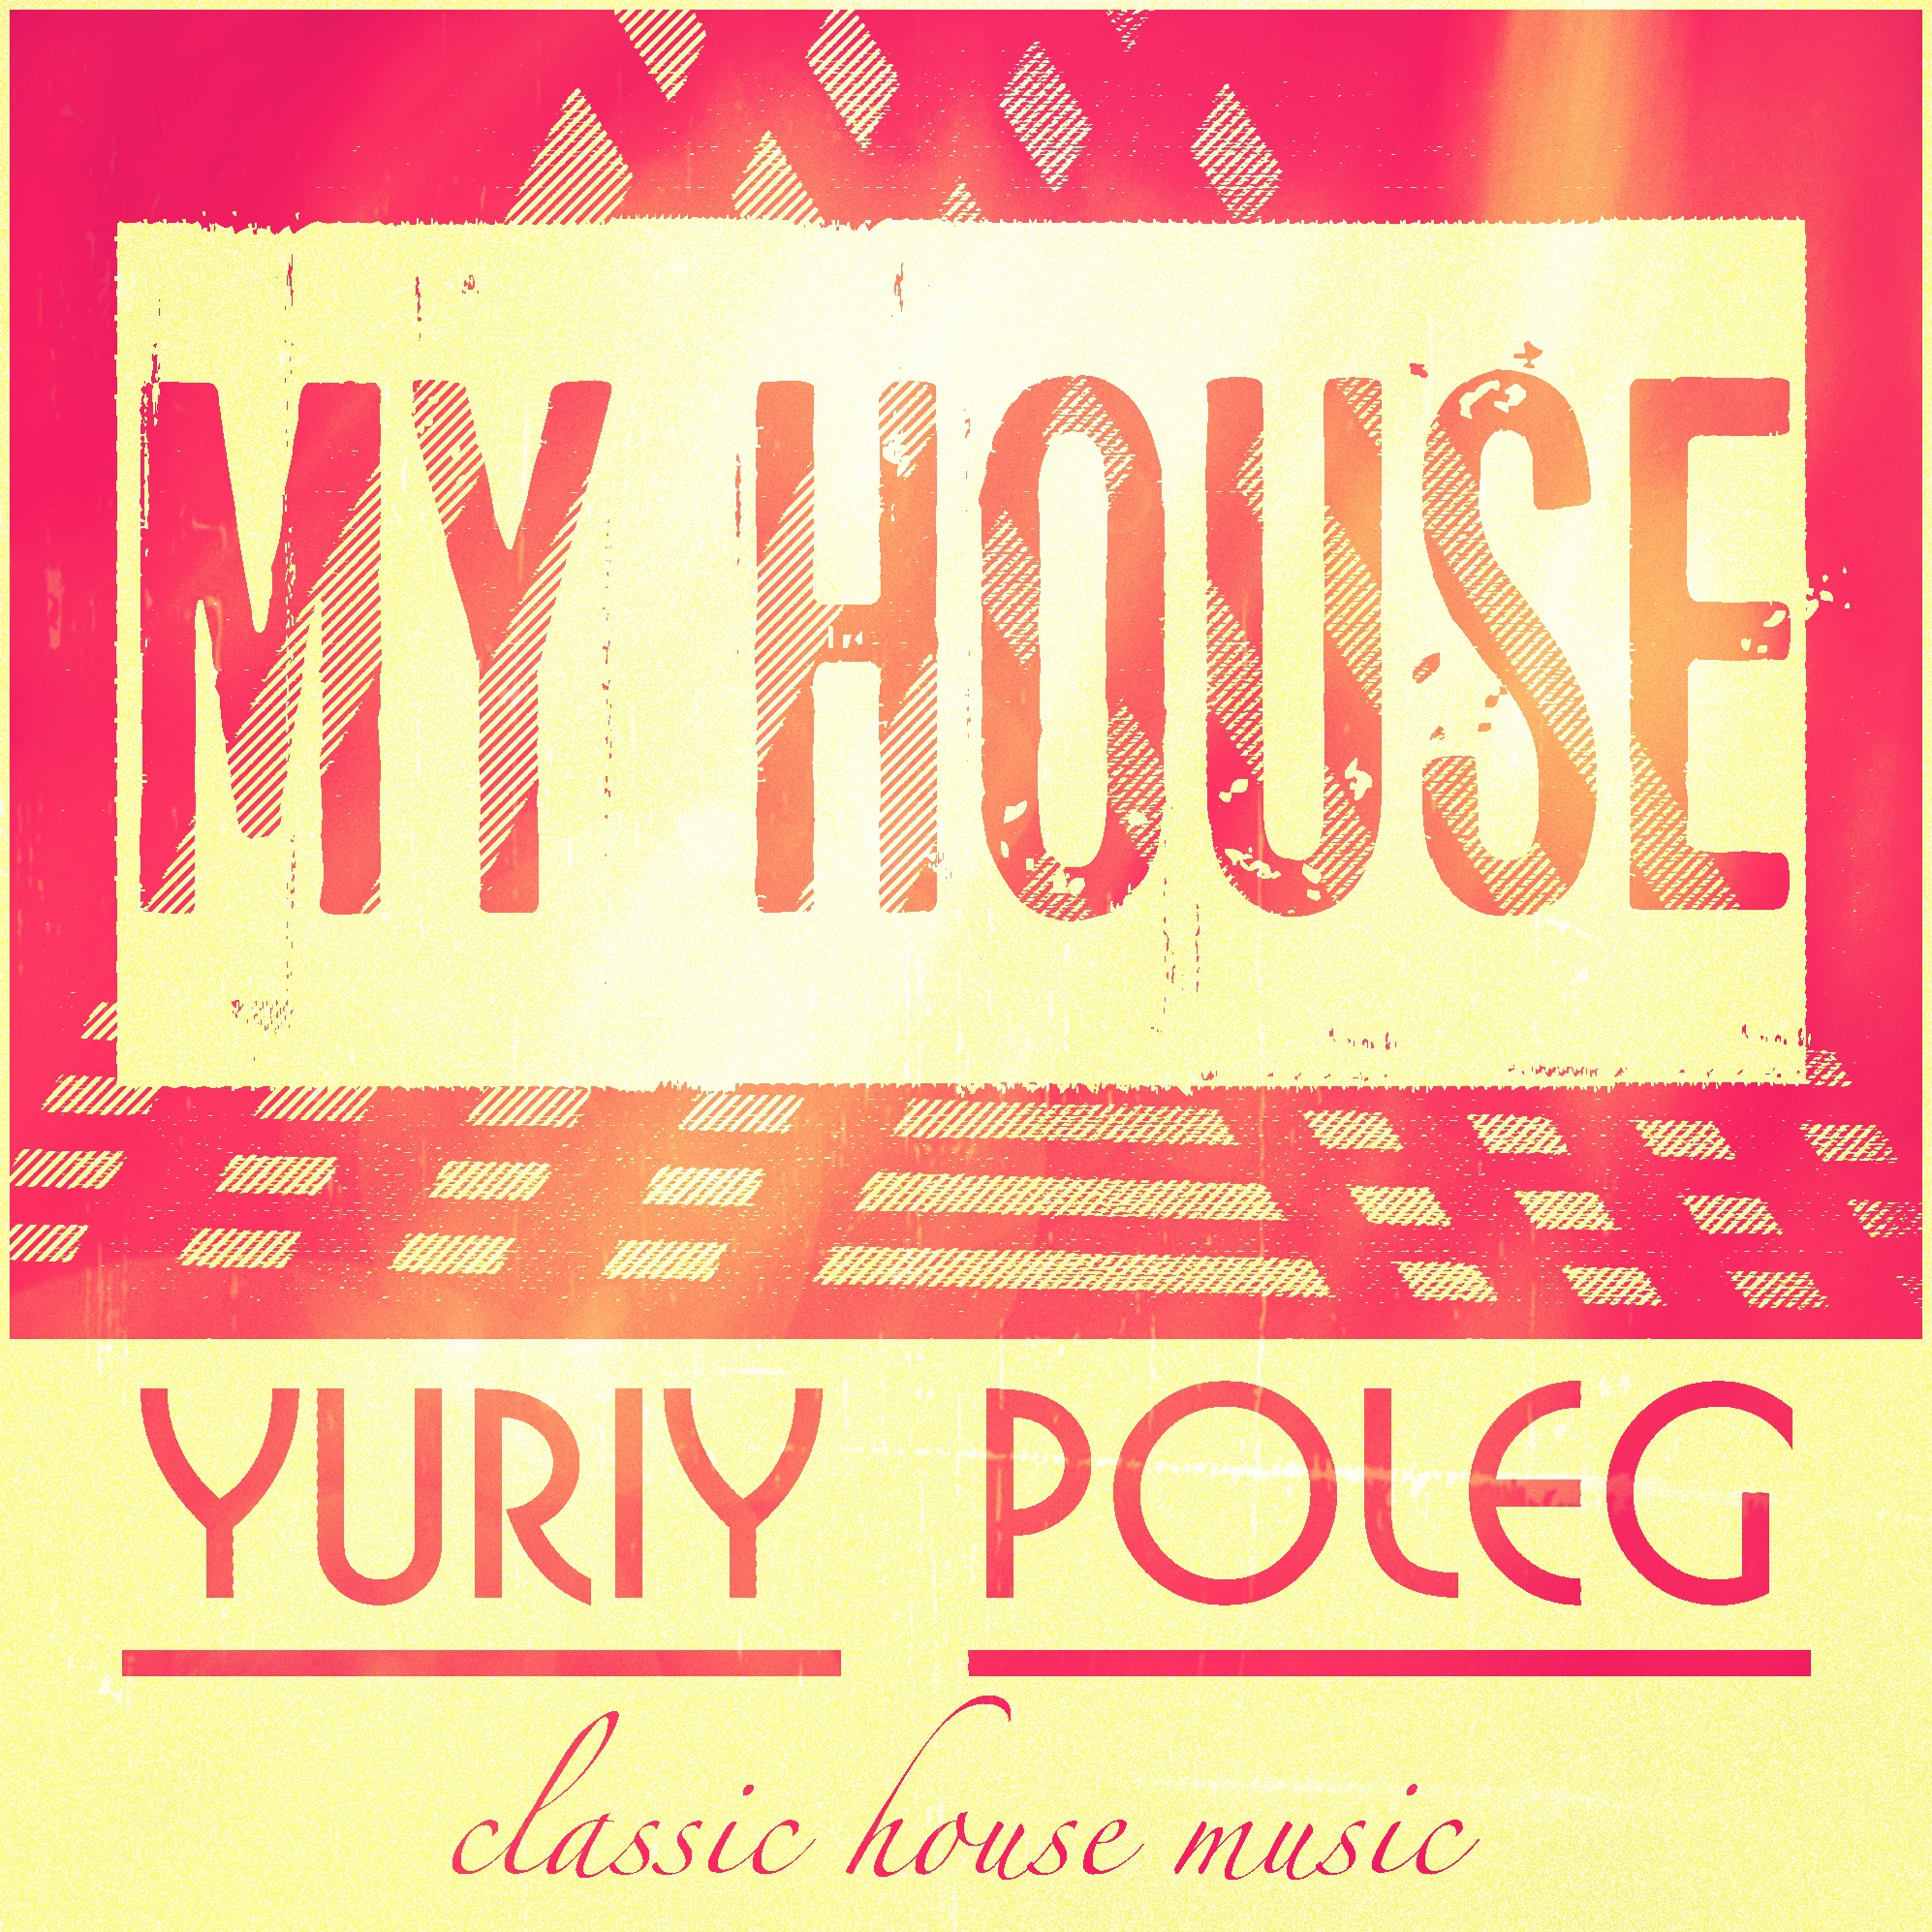 Yuriy Poleg - My House (Original Mix)